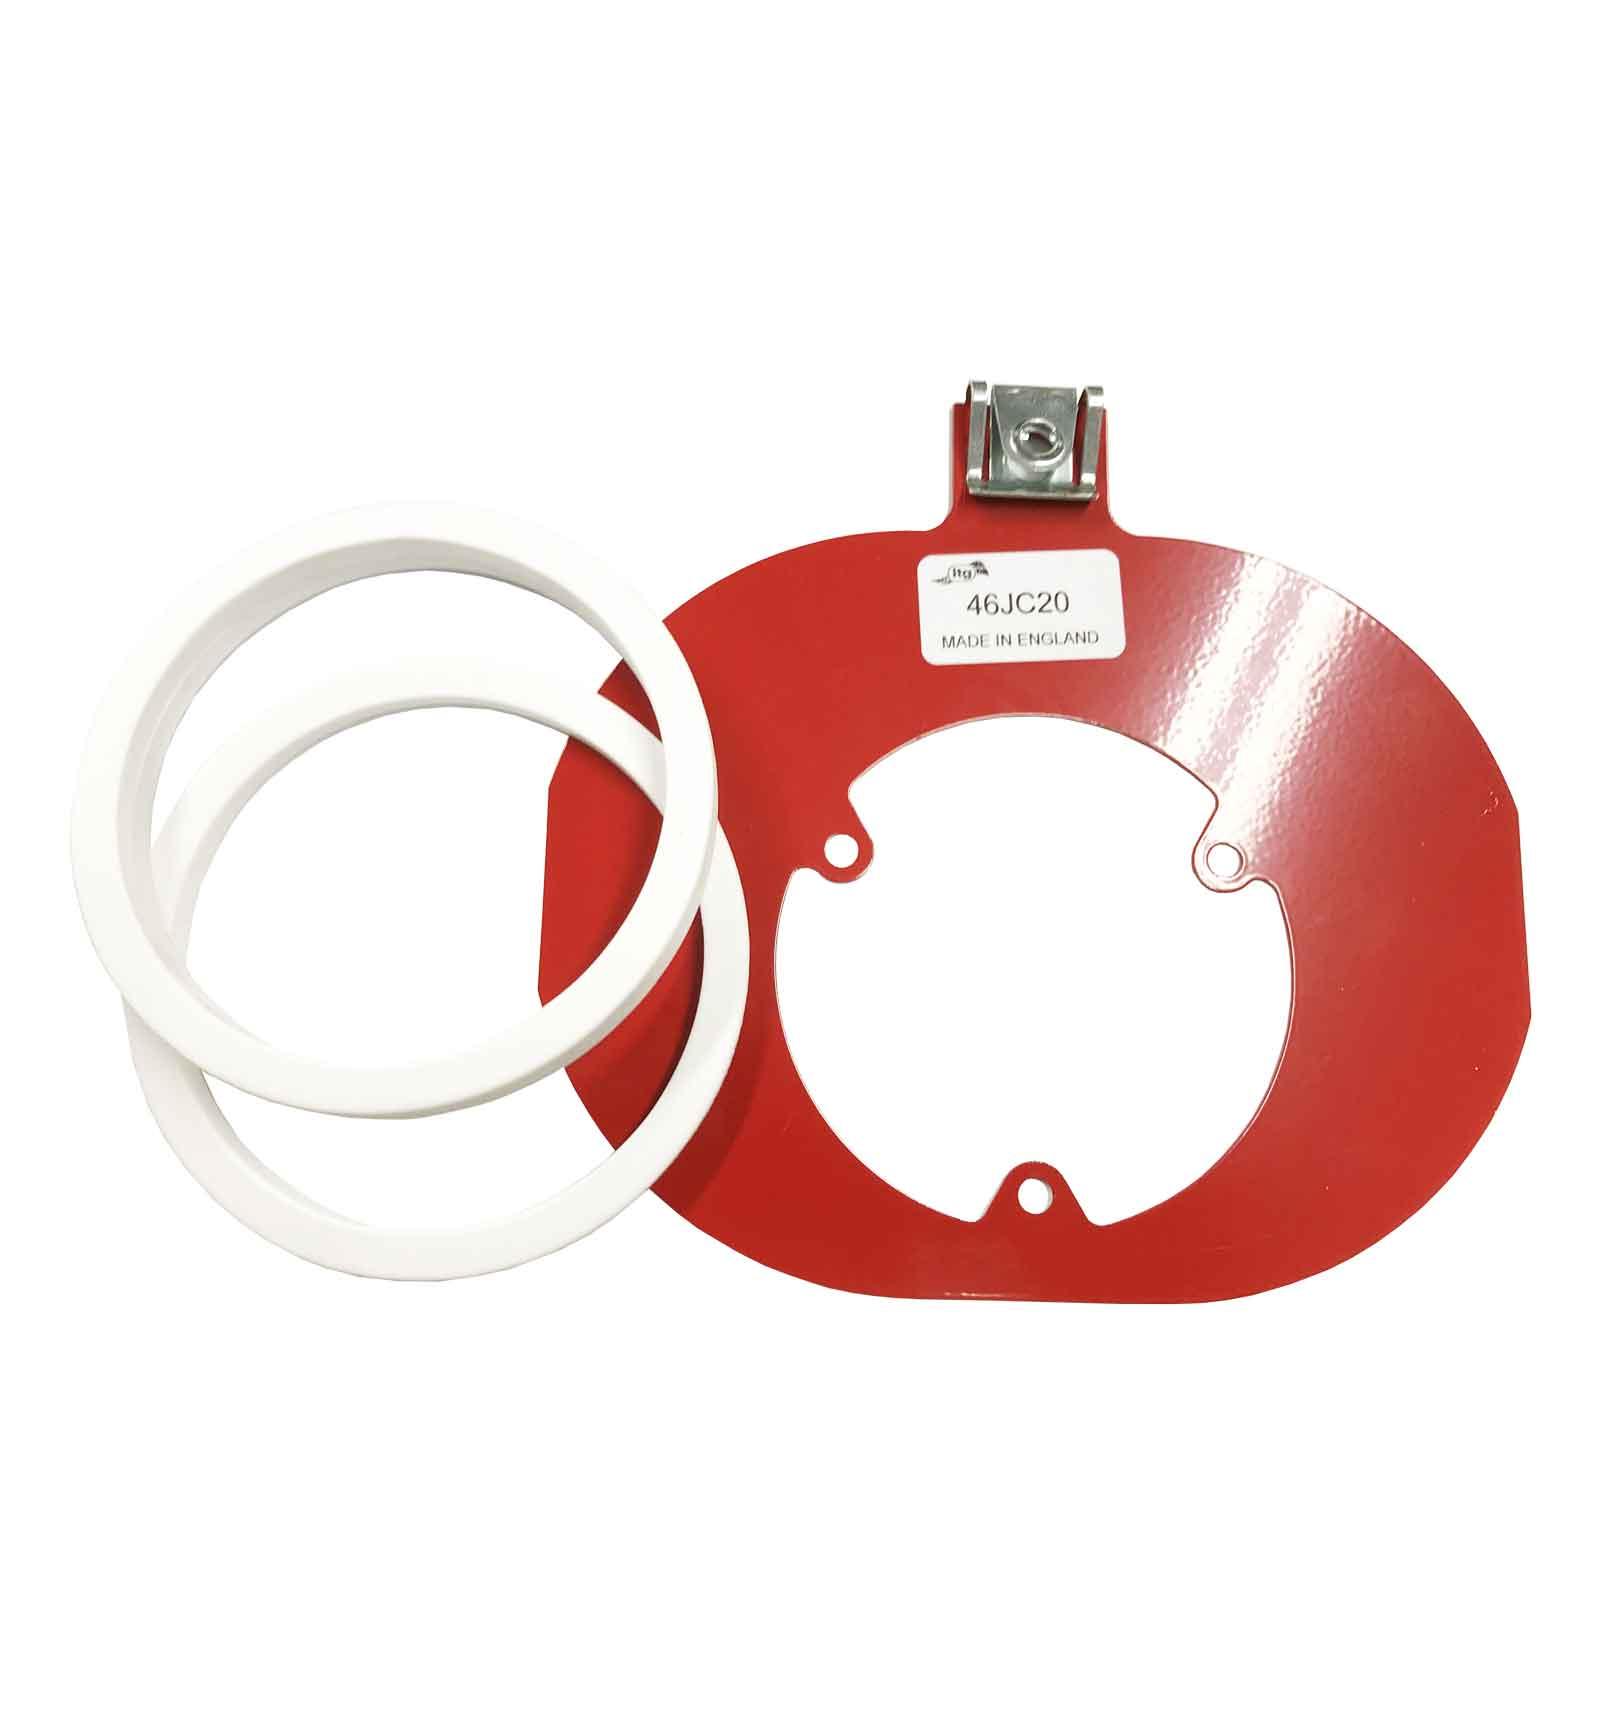 46JC20 ITG Base Plate For JC20 Filter